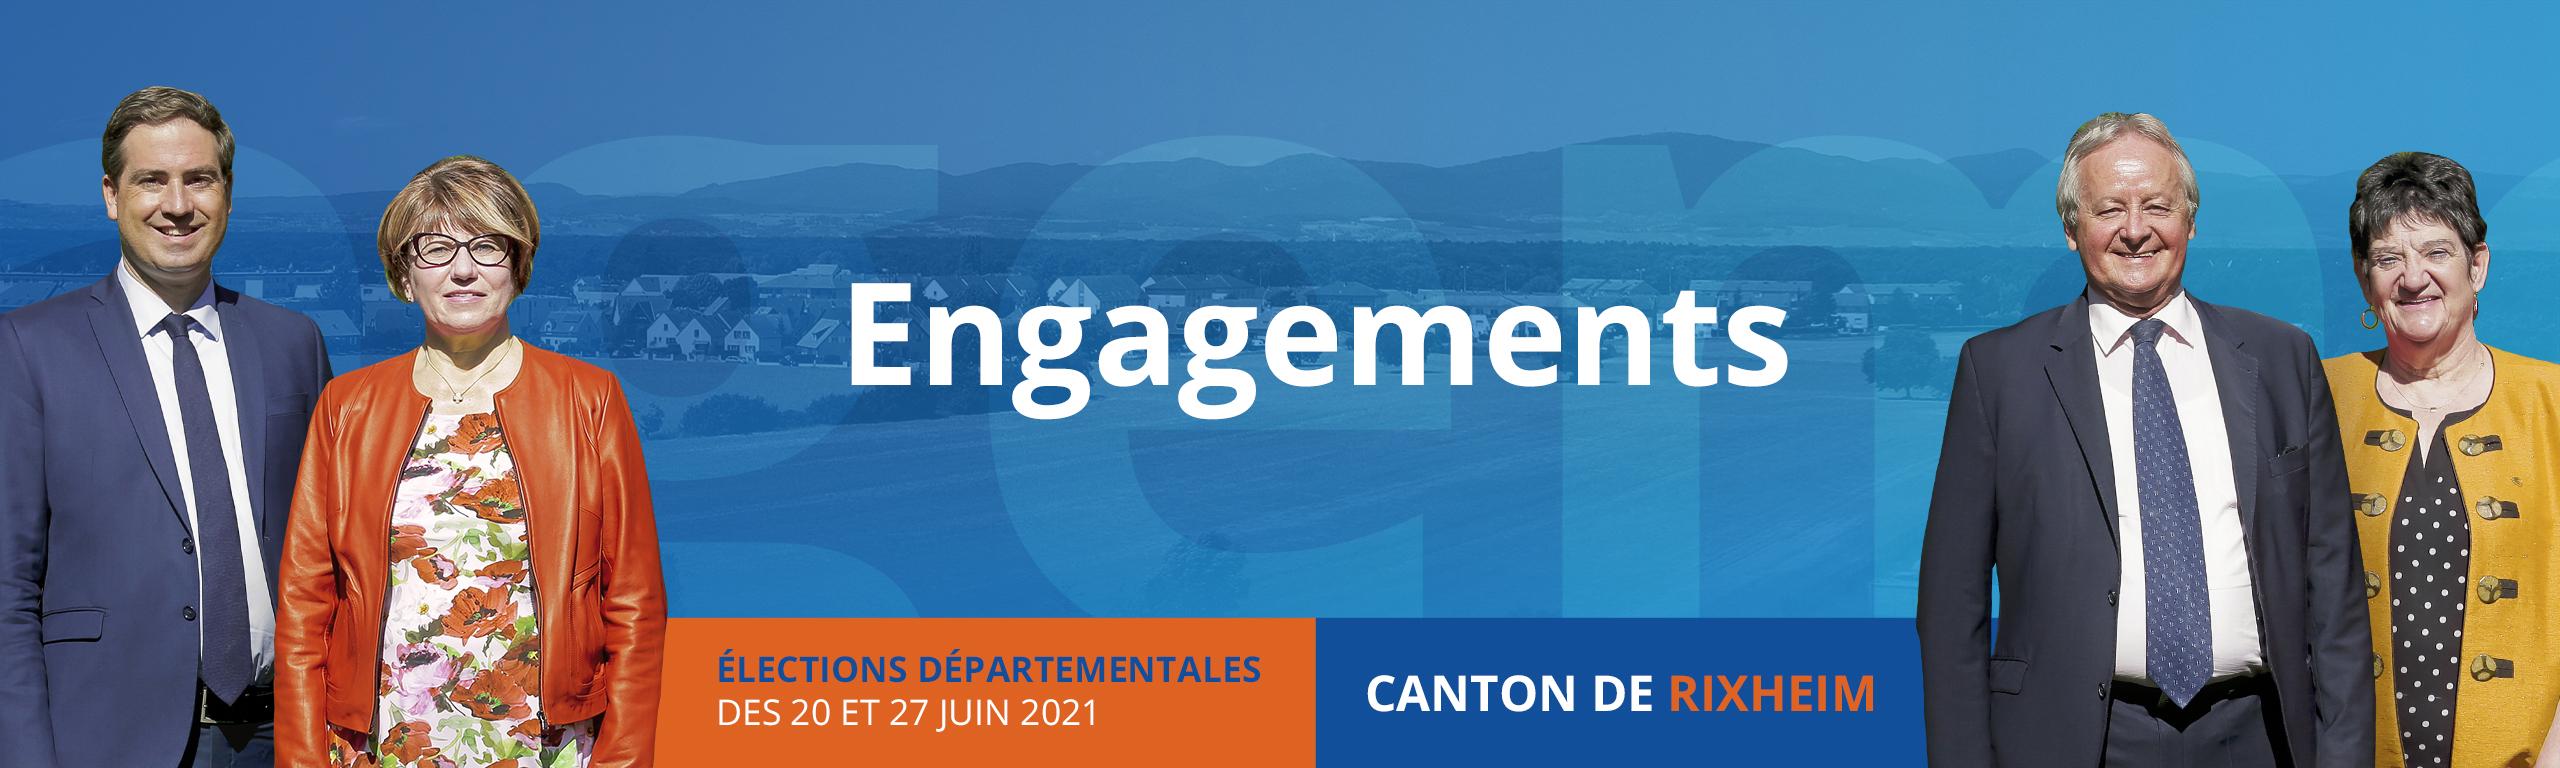 engagements_2560x768